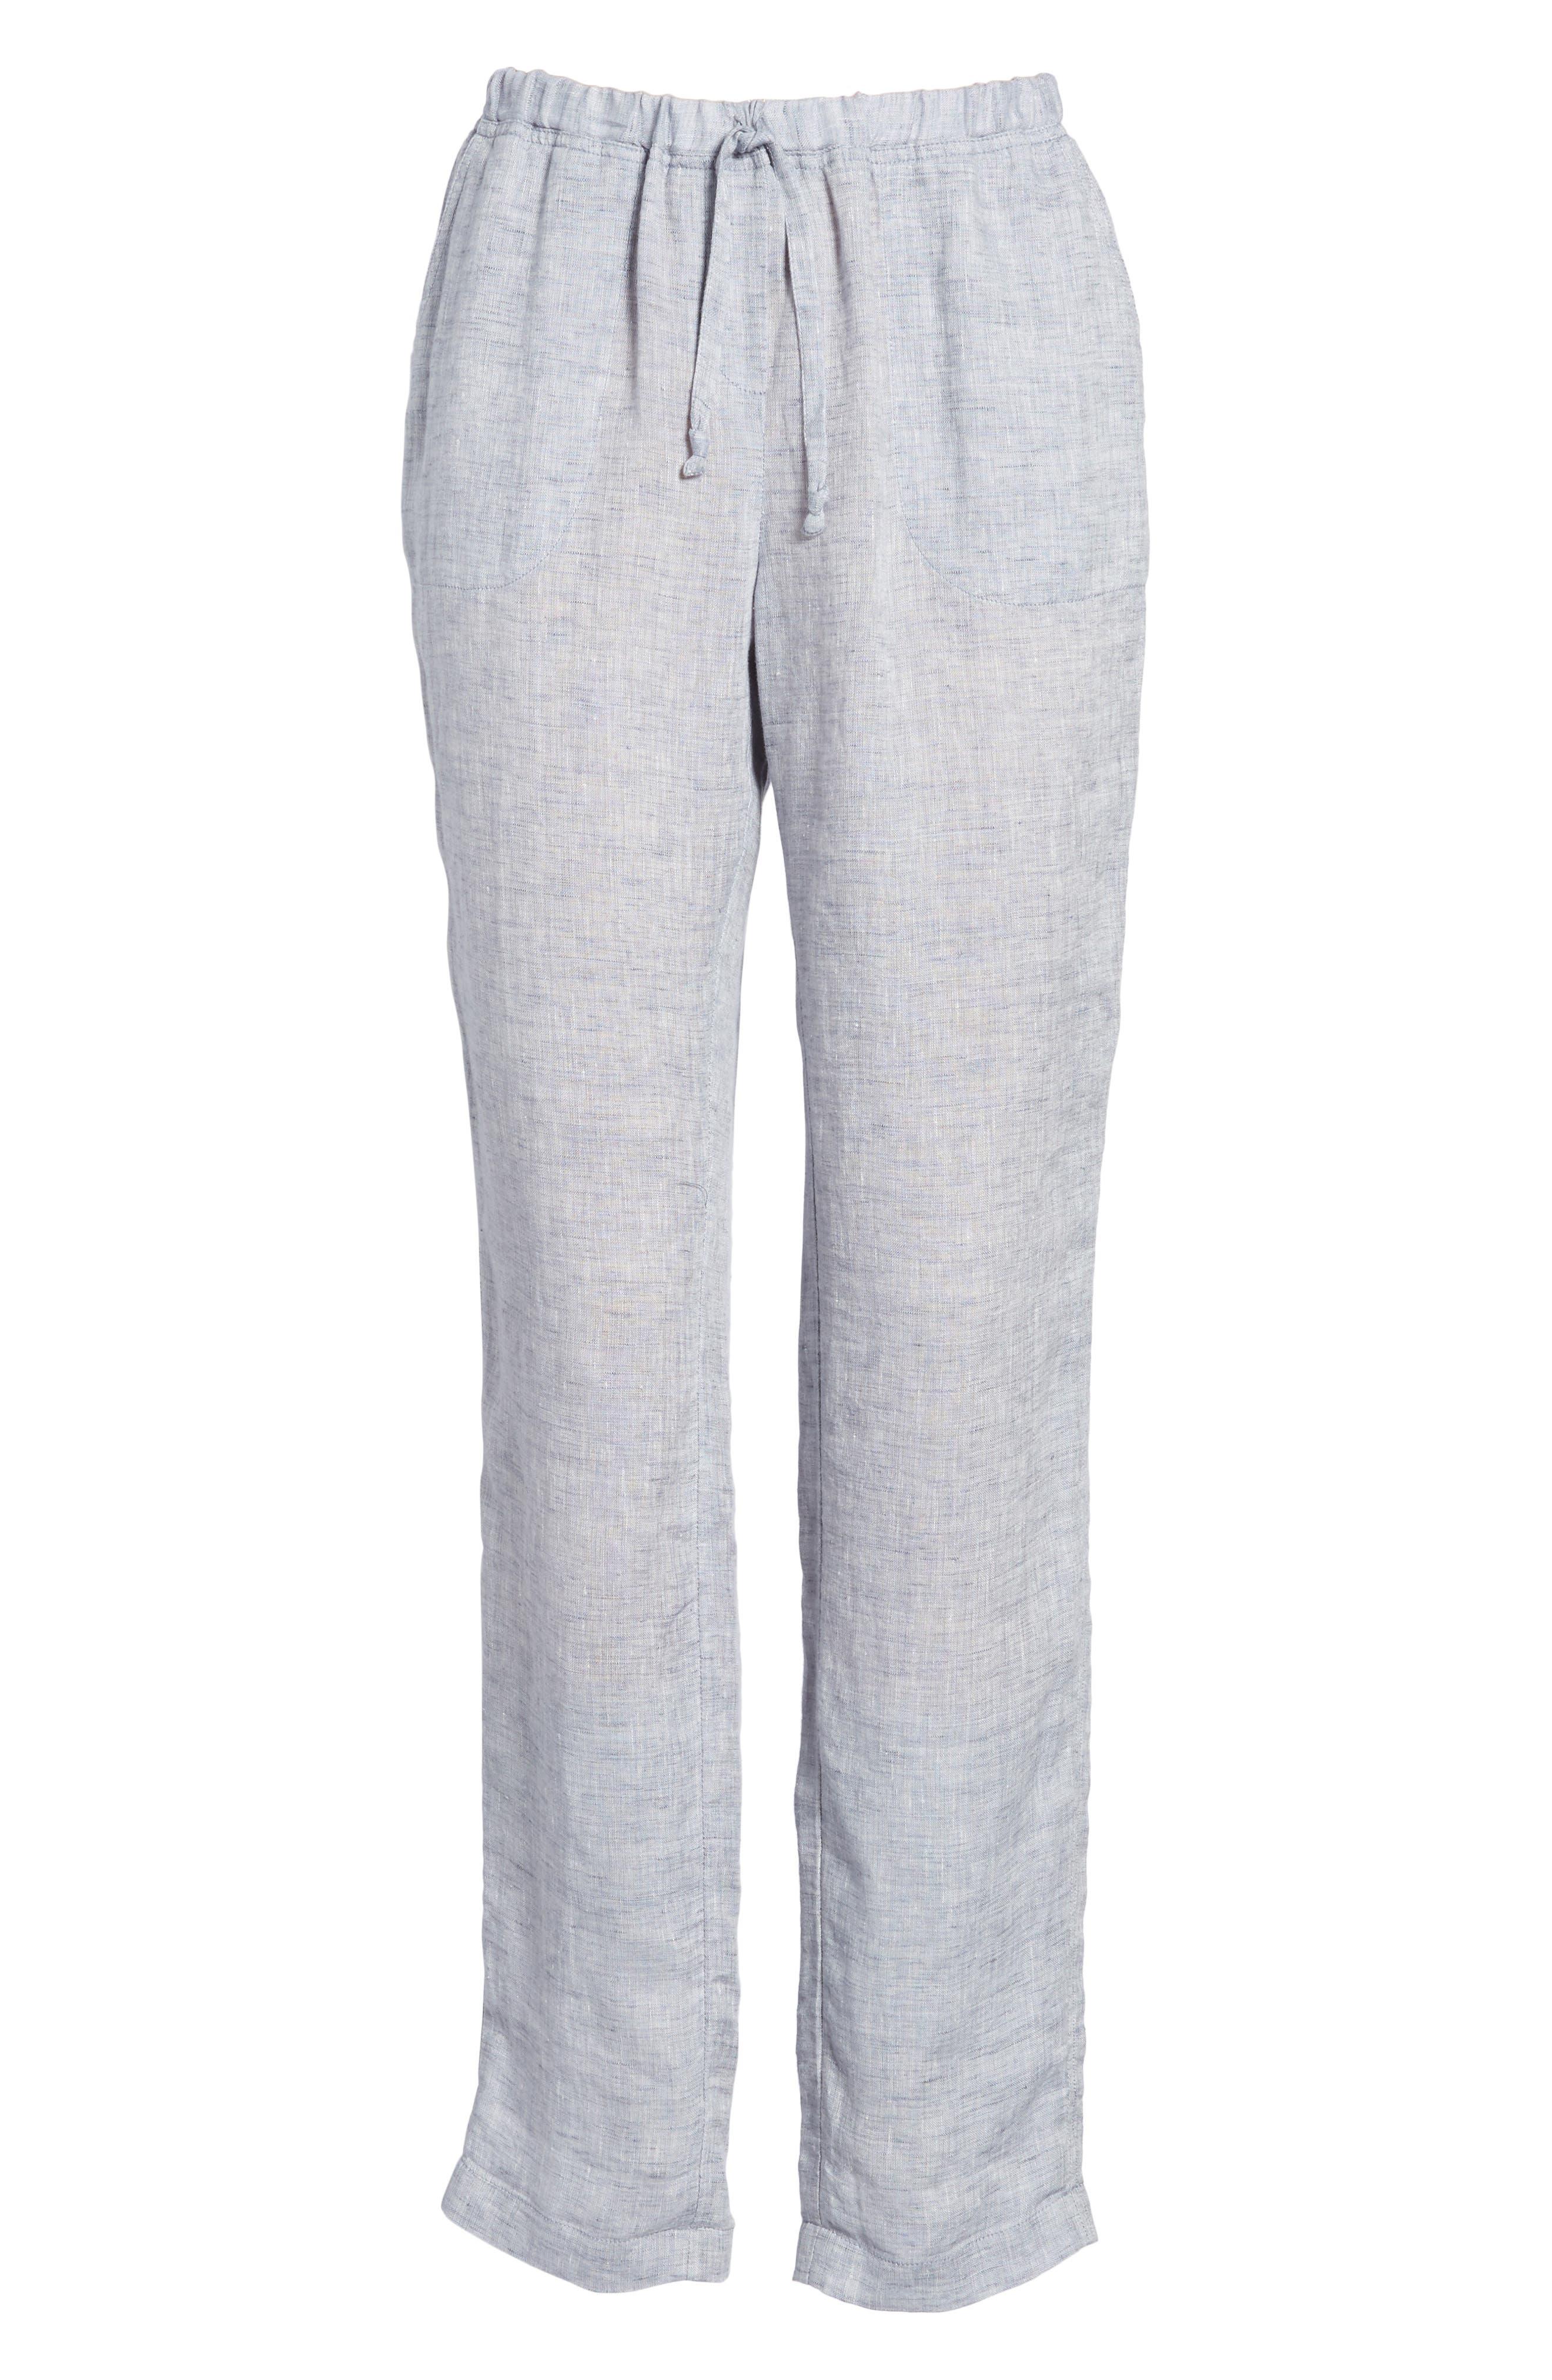 Laid Back Linen Pants,                             Alternate thumbnail 7, color,                             Indigo Mix